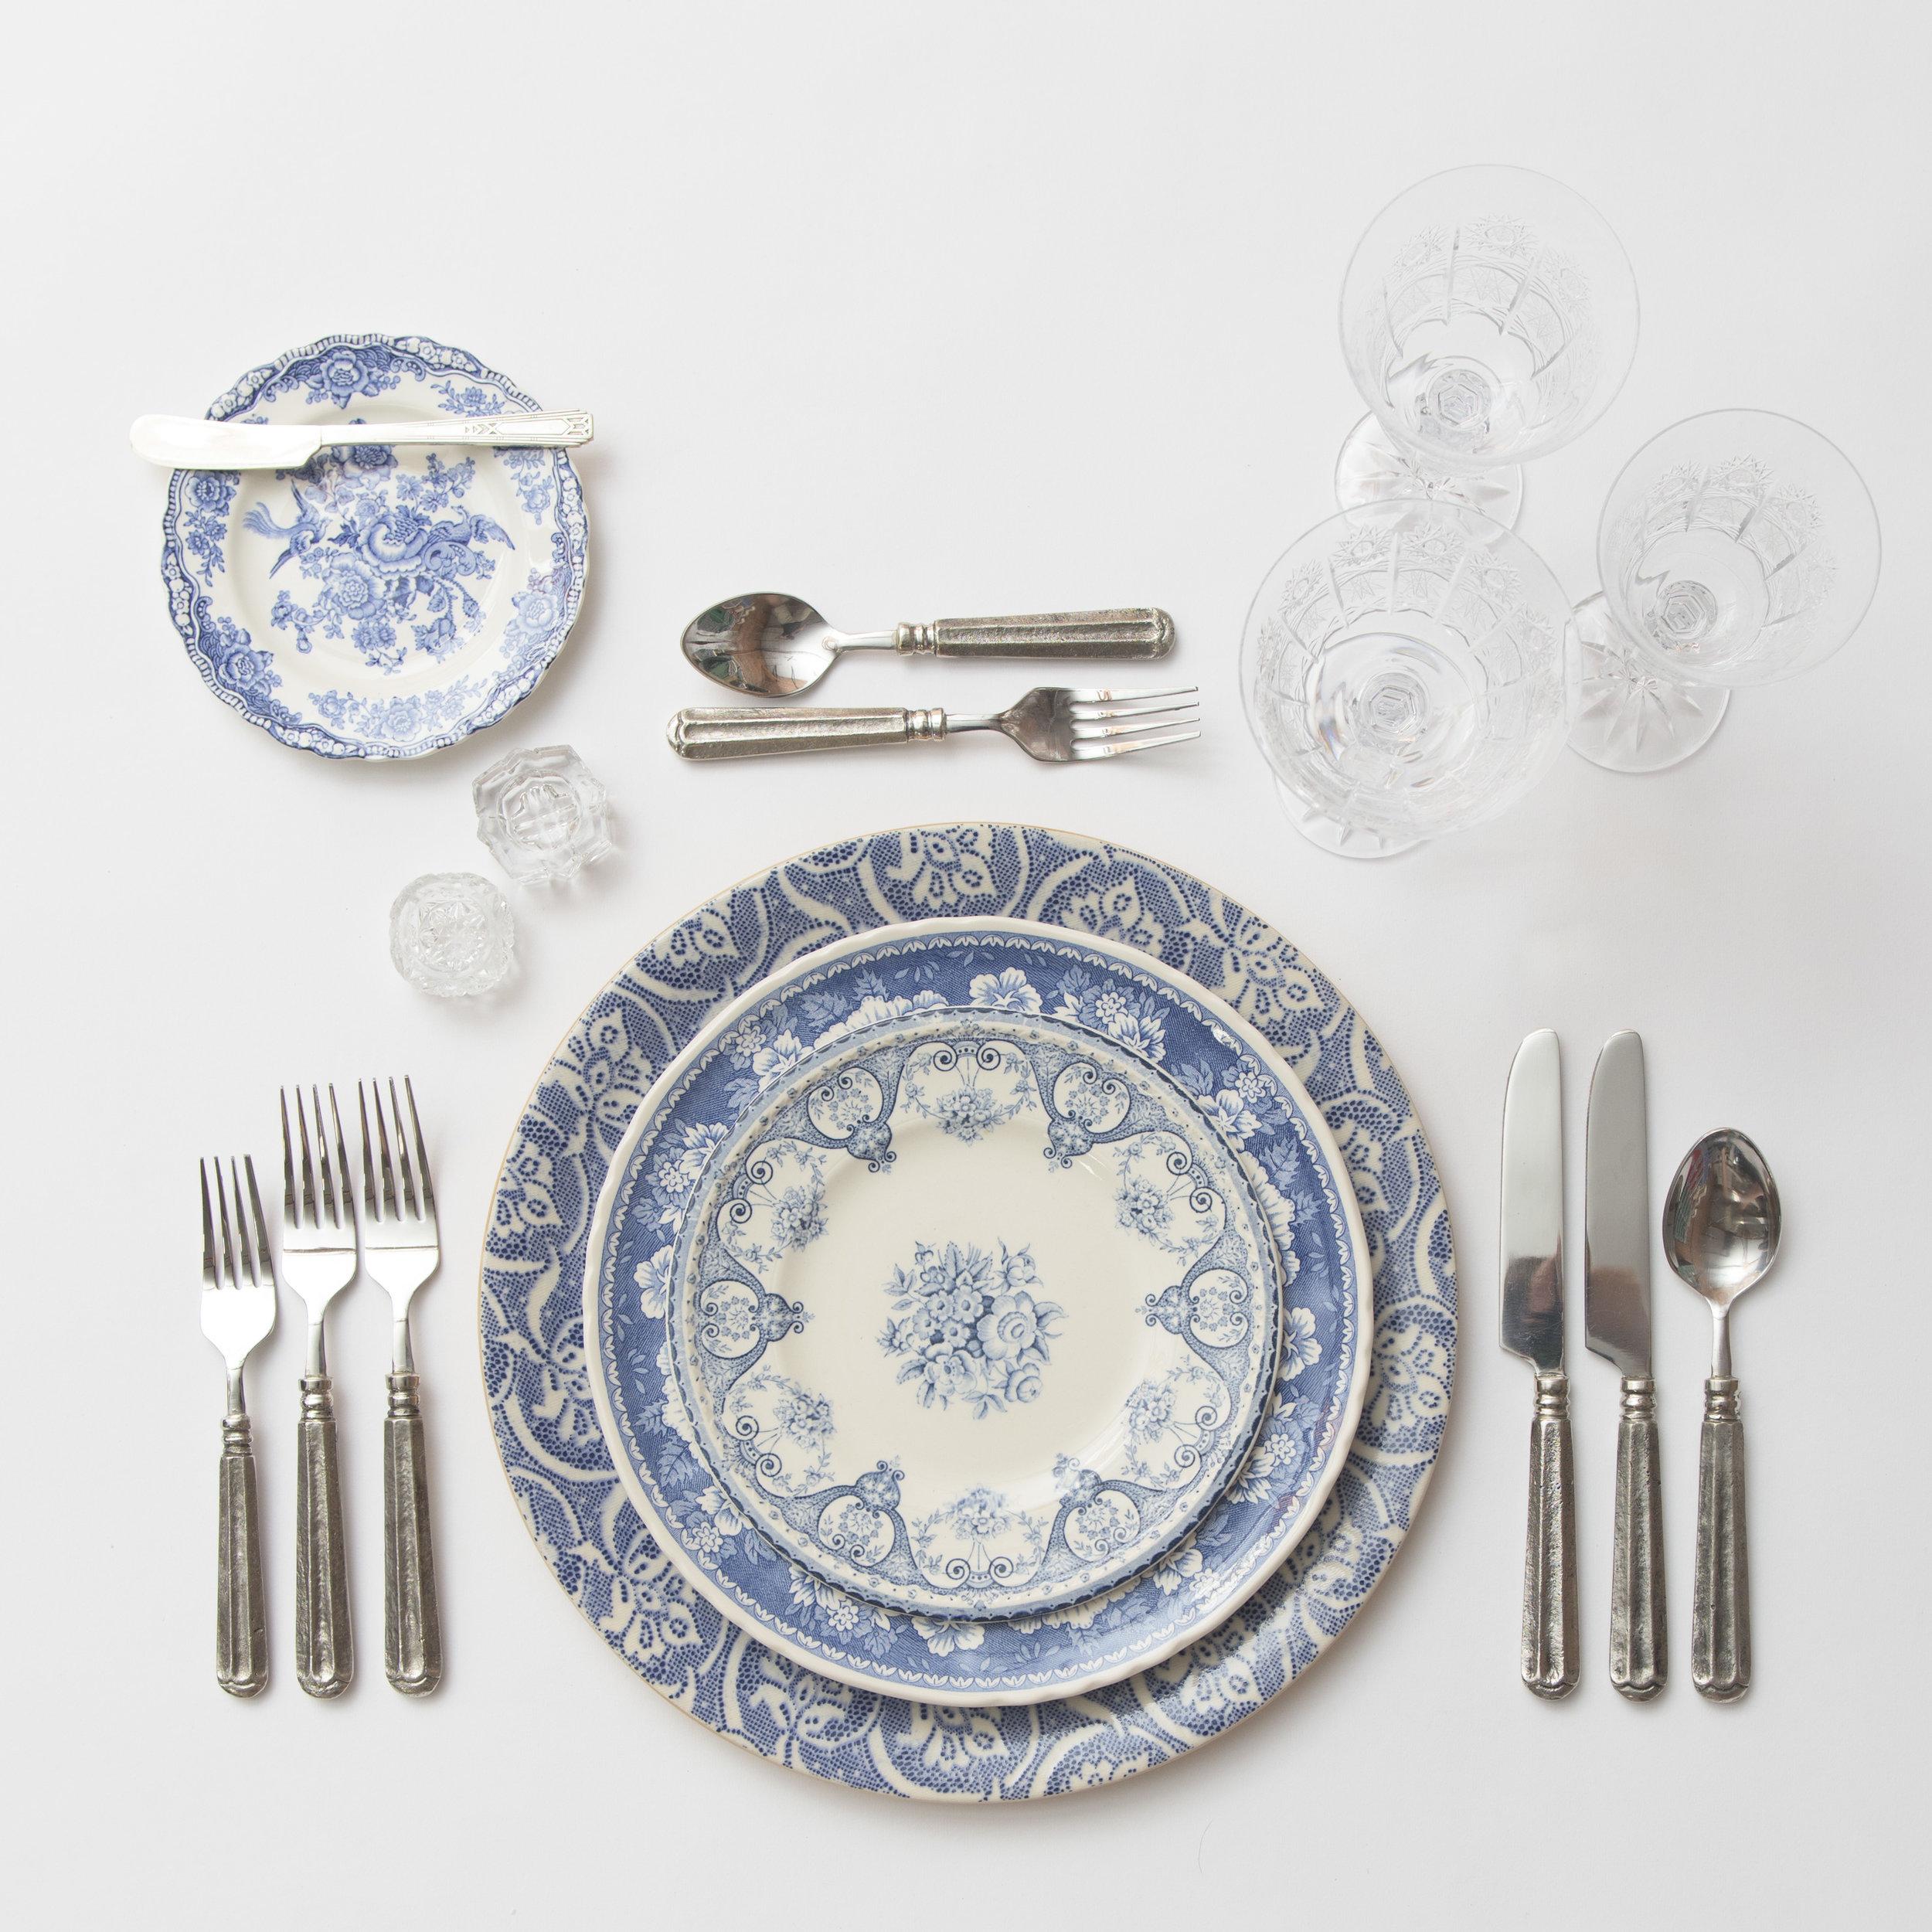 RENT: Blue Fleur de Lis Chargers +Blue Garden Collection Vintage China + Tuscan Flatware in Pewter + Czech Crystal Stemware + Antique Crystal Salt Cellars